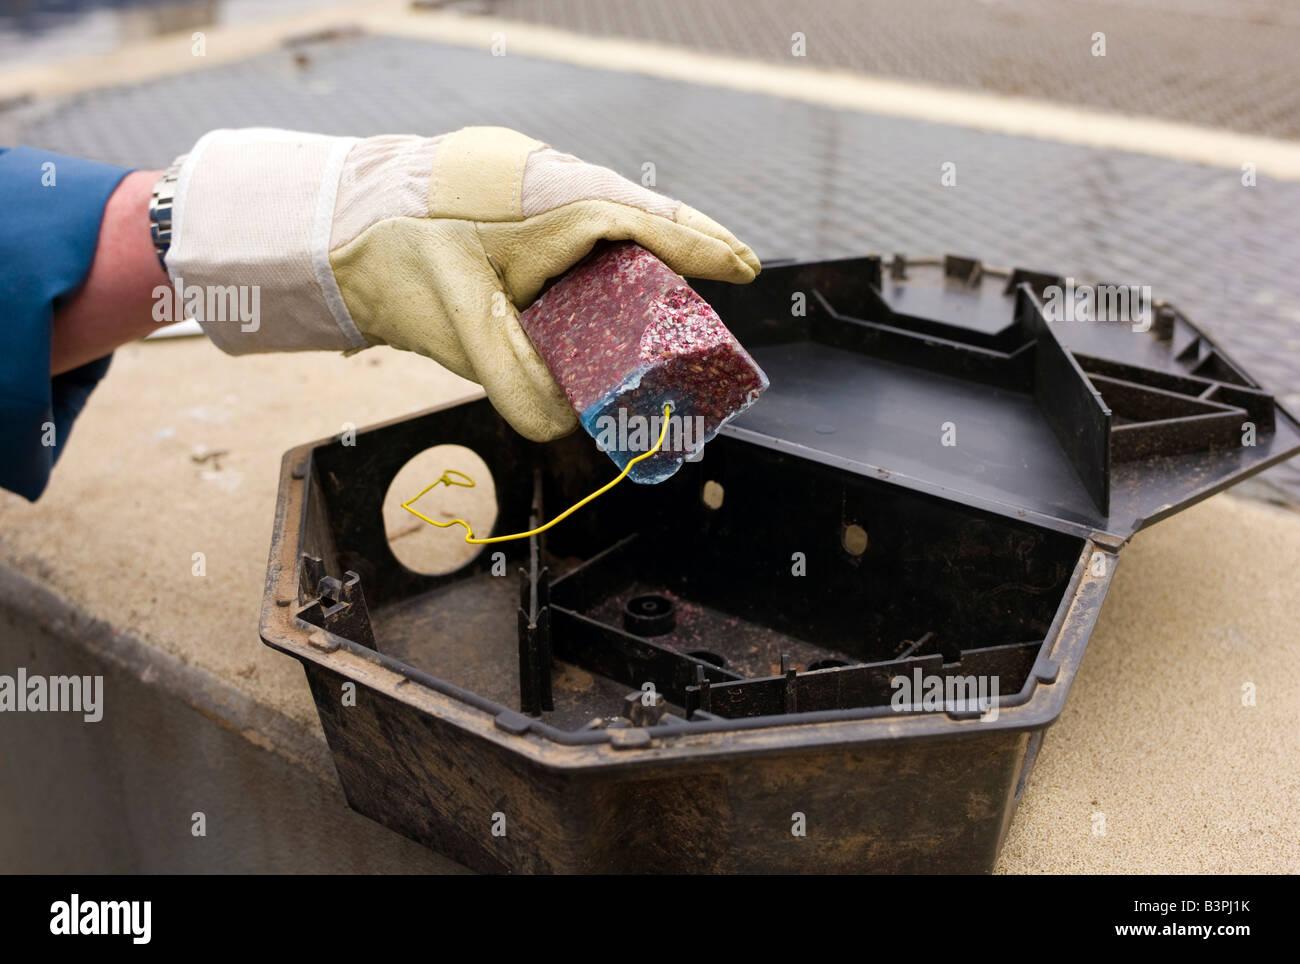 how to build a rat trap car